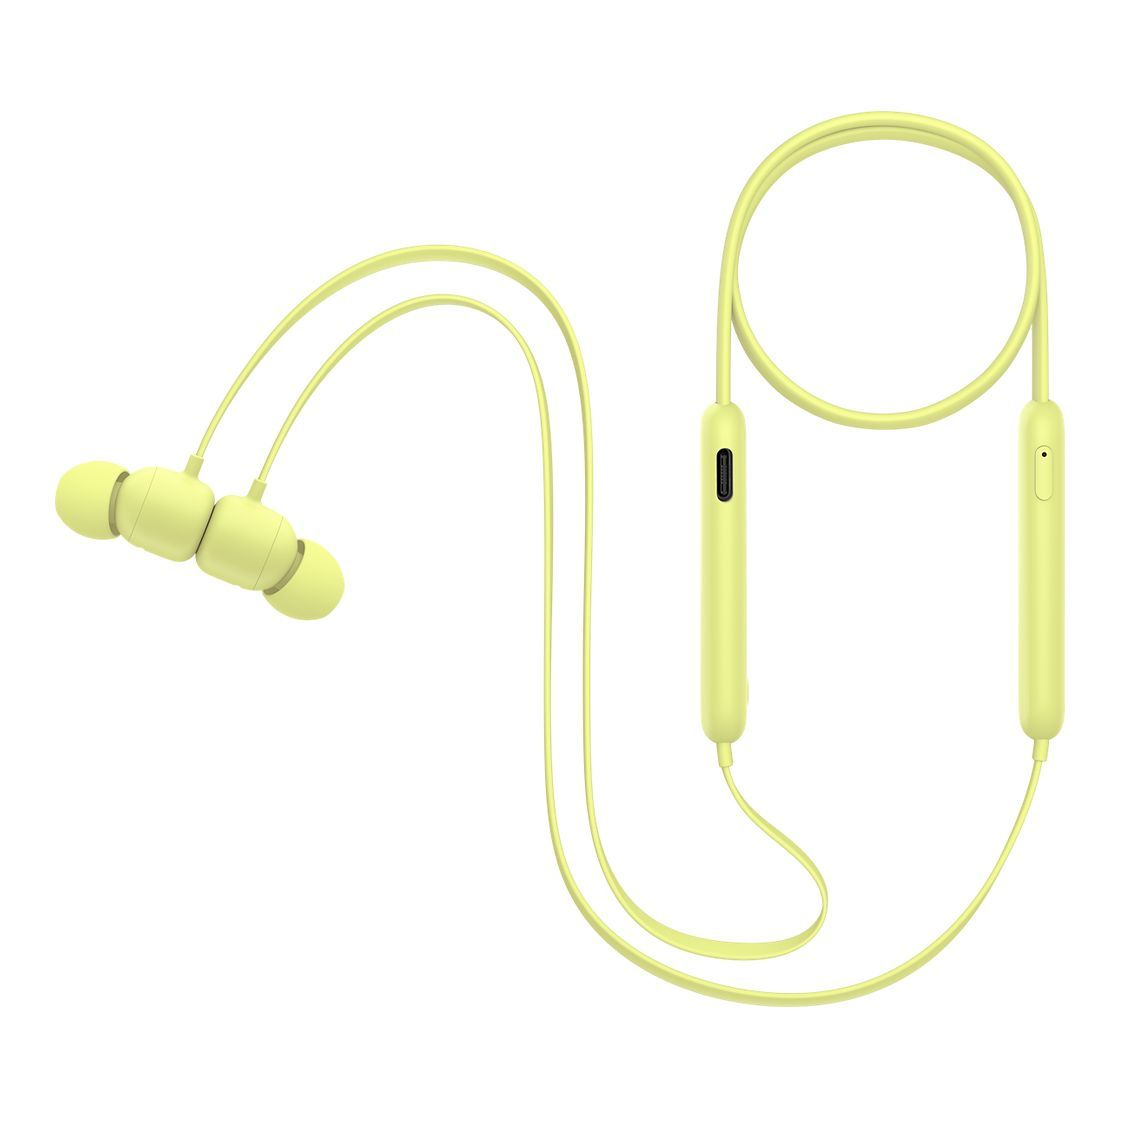 Beats Flex All Day Wireless Earphones Yuzu Yellow Wireless Earphones Bluetooth Earphones Earphone